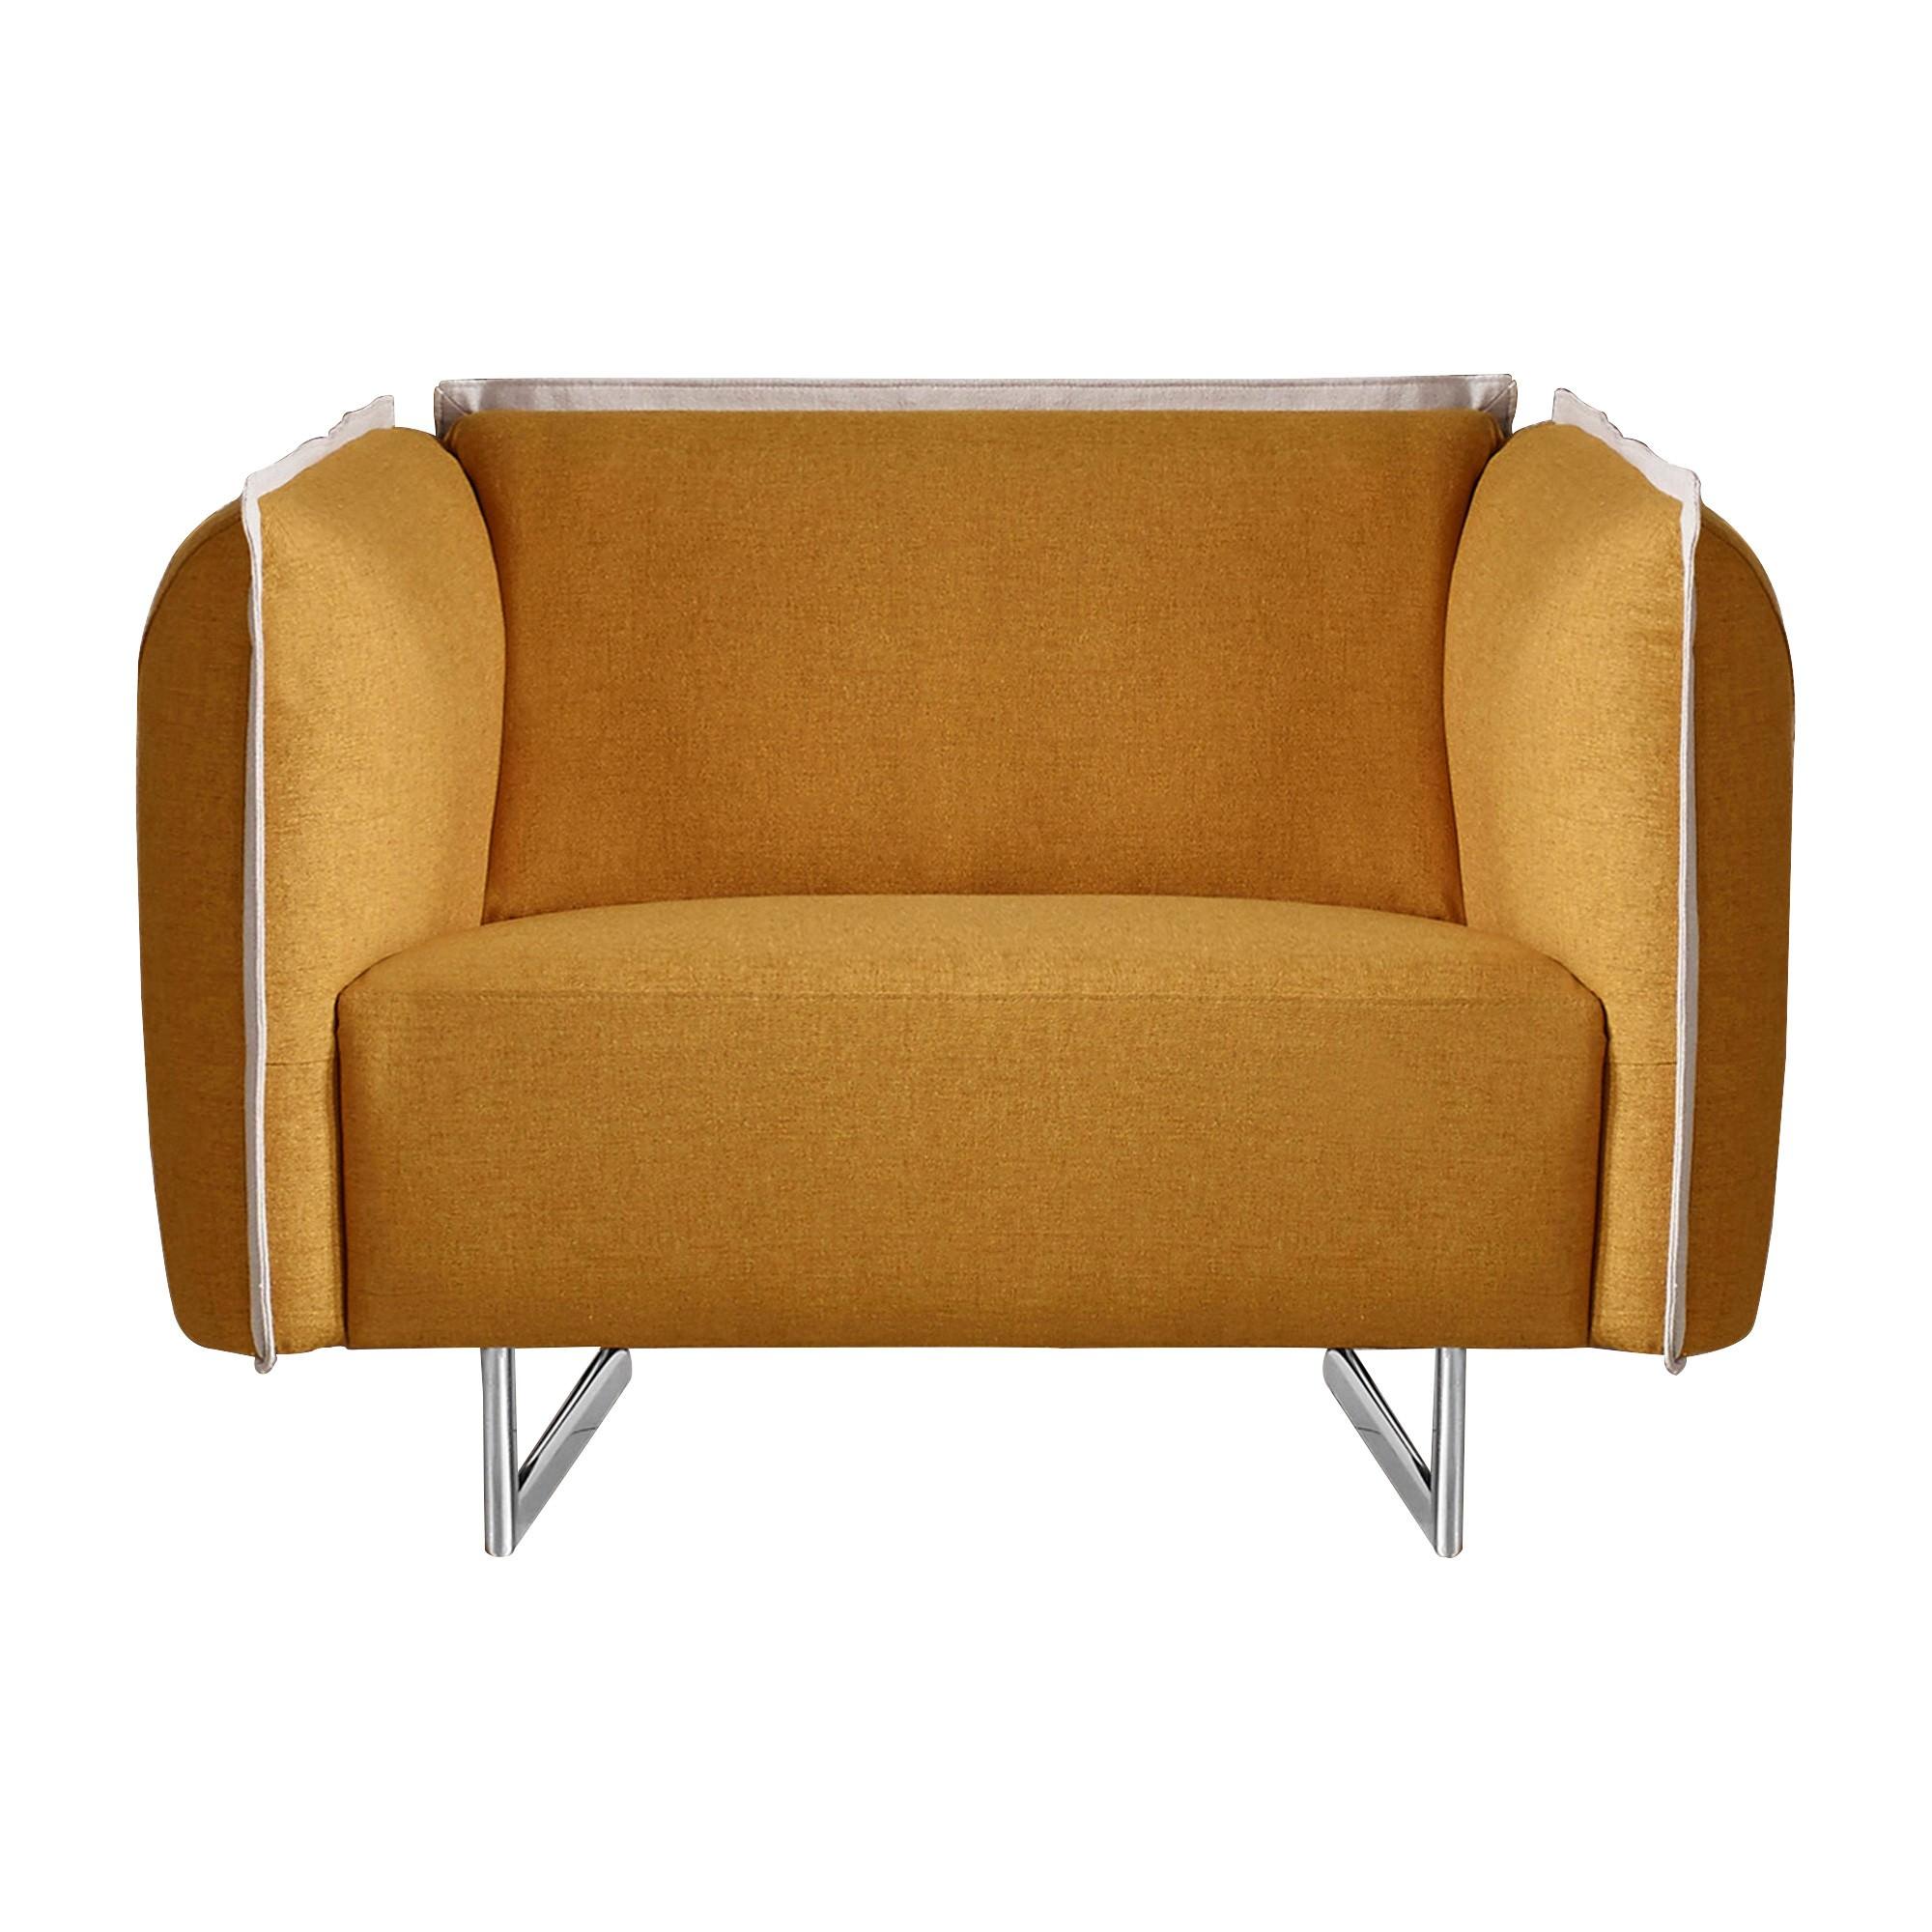 Peyton Fabric Armchair, Yellow